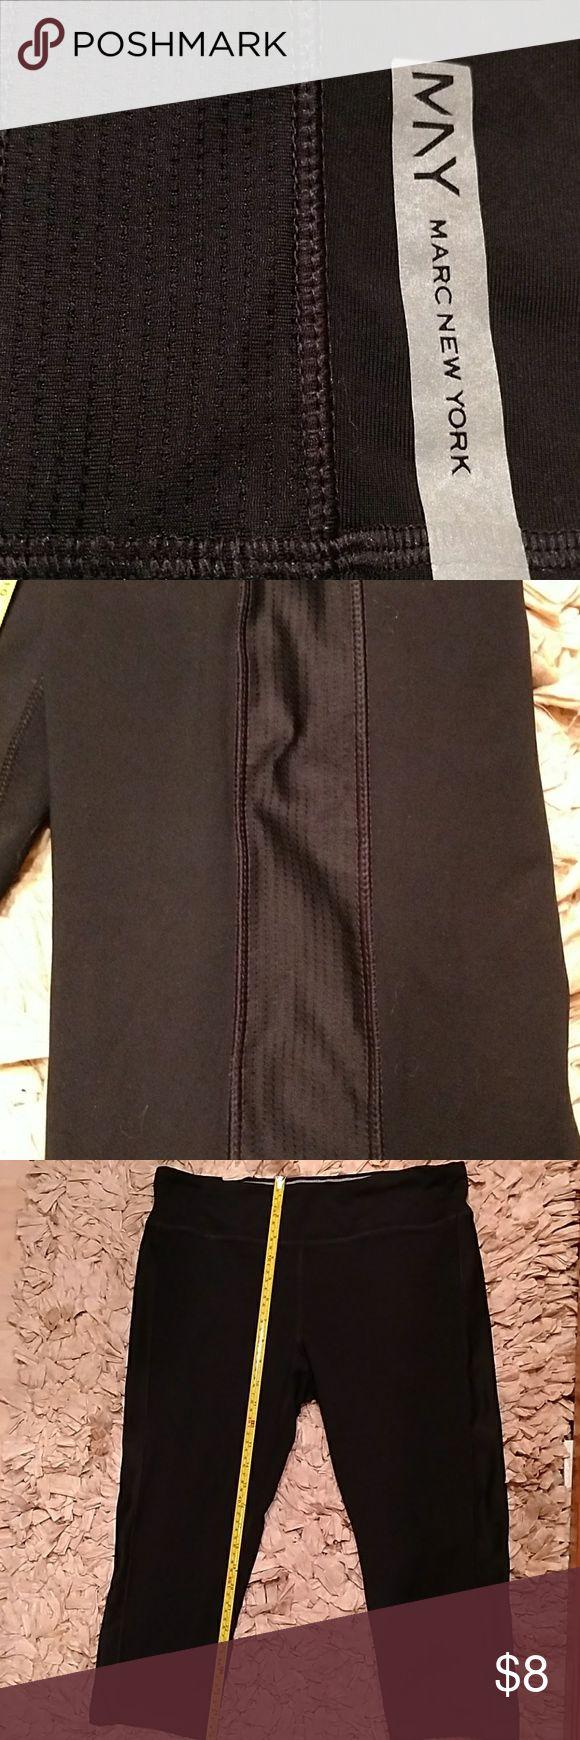 Andrew Marc New York Yoga Capri Jogger Leggings XL Andrew Marc Sz XL Black 80% Nylon 12% Spandex Capri Jogger Leggings.   EUC... Worn maybe 2x. No signs of piling. Plenty of love to give!  :)  Xo Andrew Marc Pants Capris